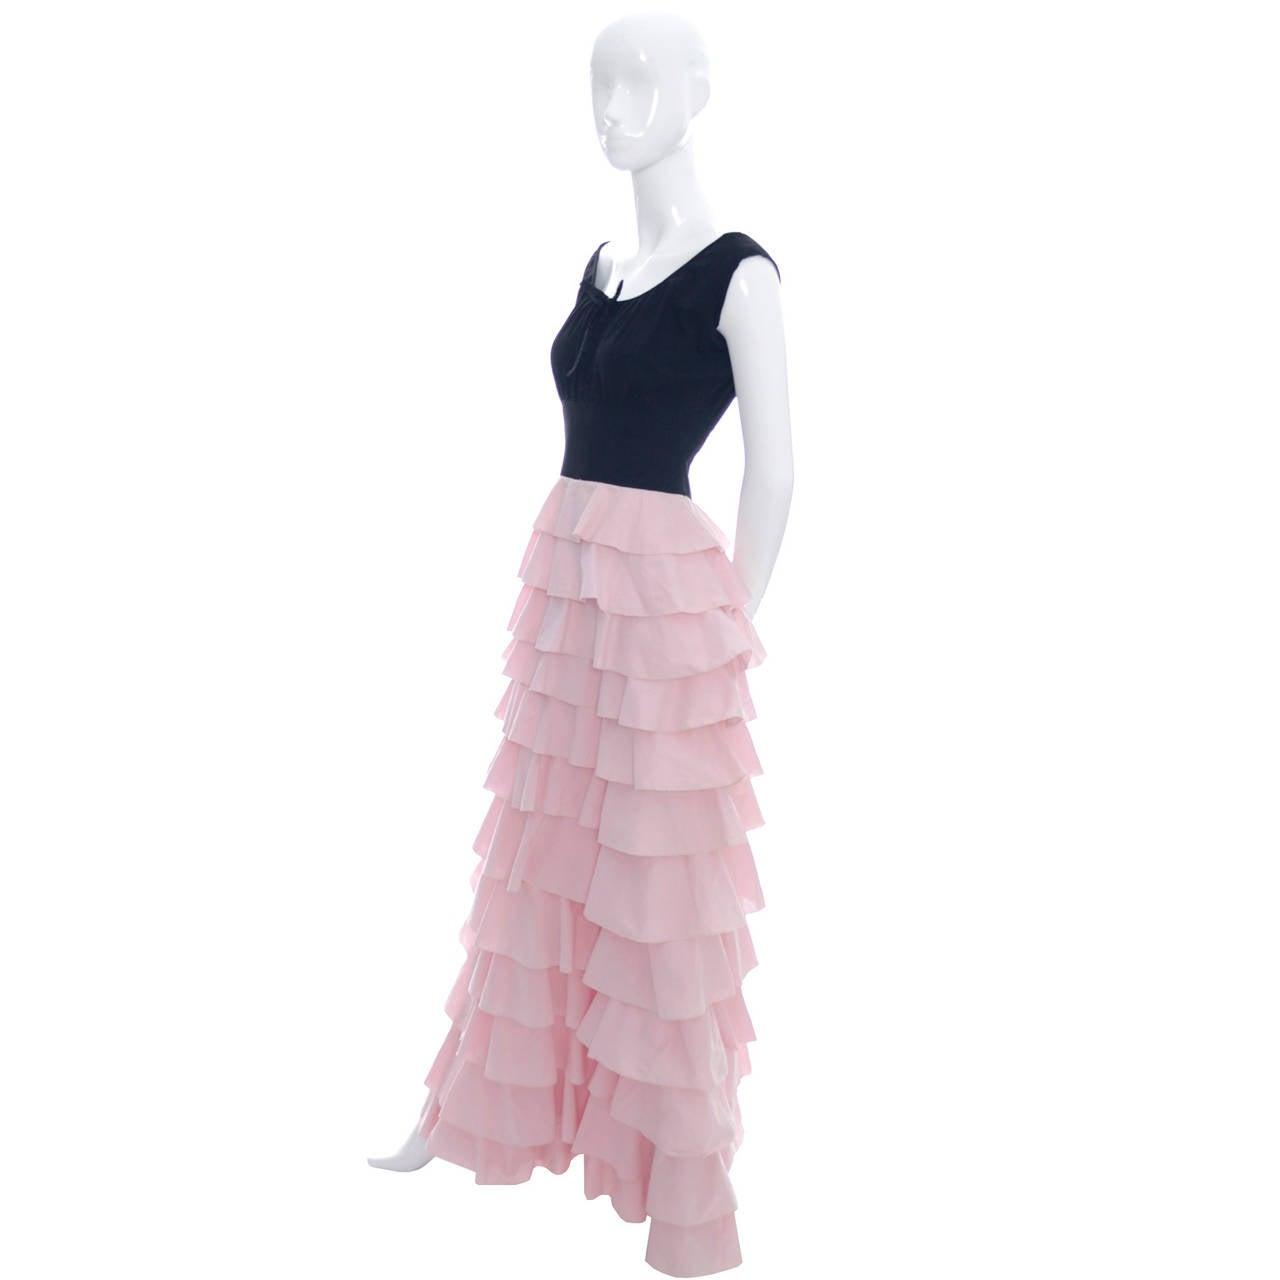 1940s Vintage Gilbert Adrian Original Dress Pink Ruffles Rare Designer Gown 2